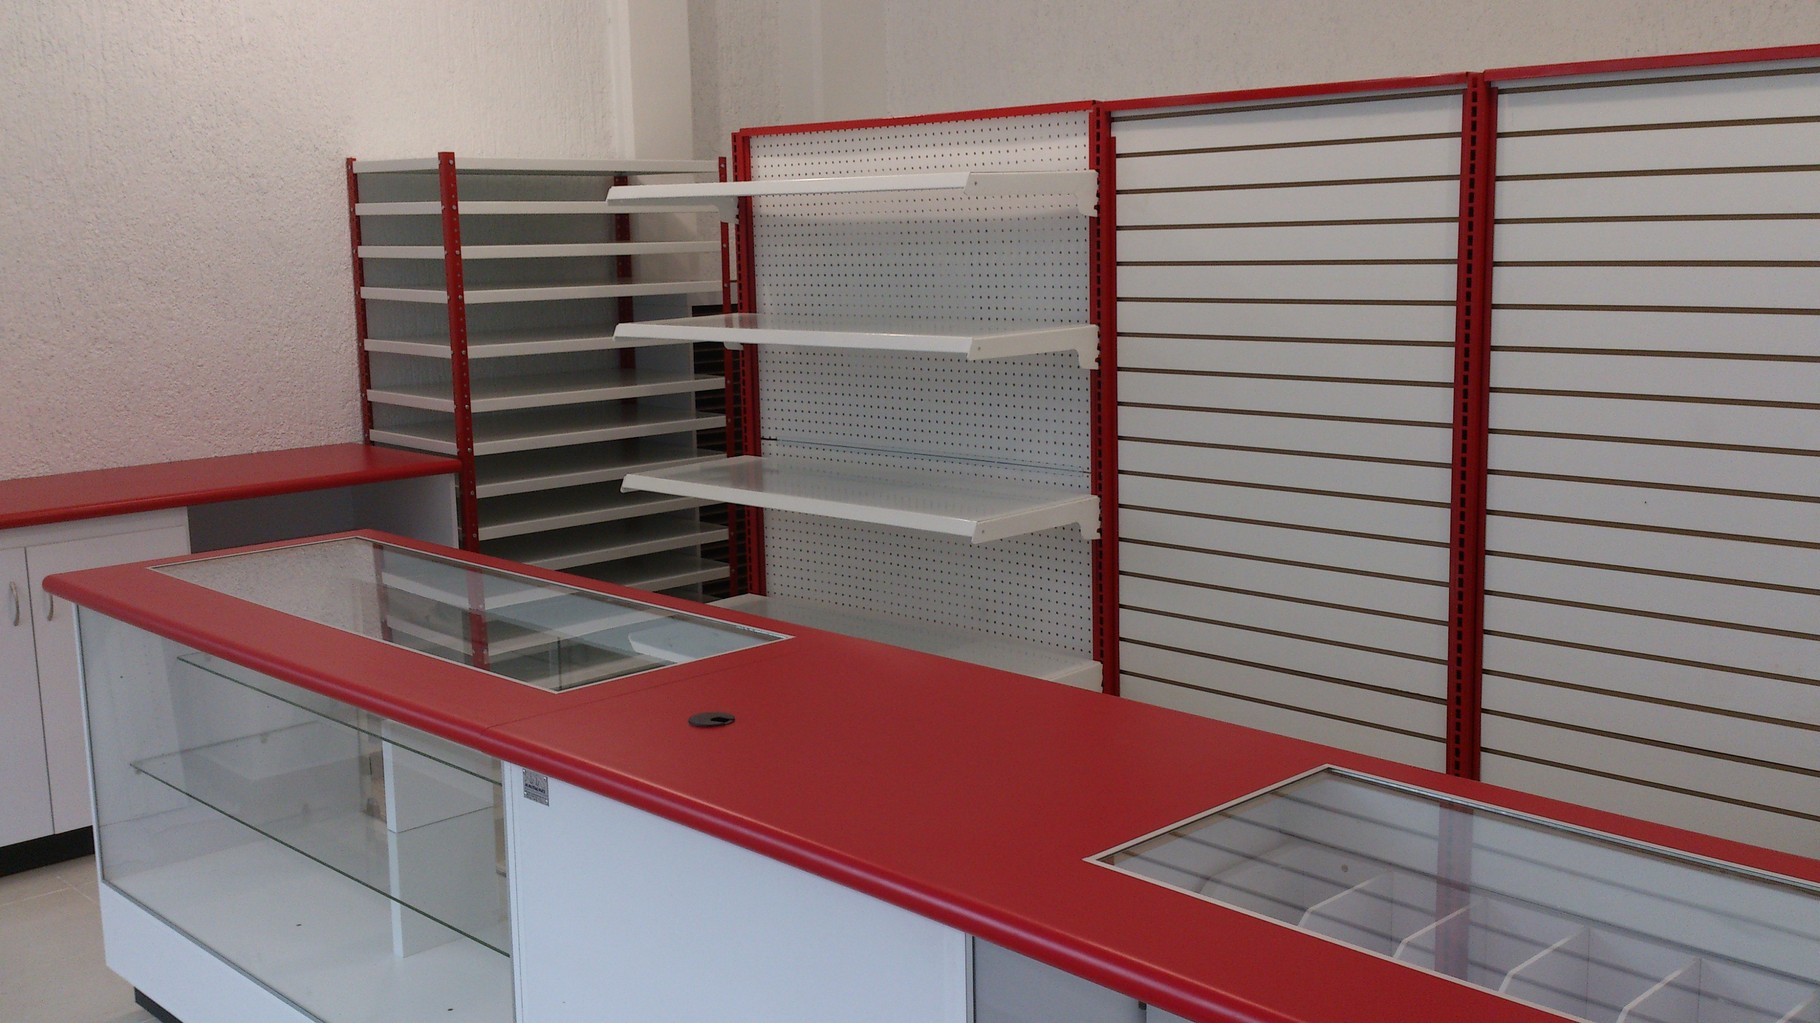 Muebles para papelería, vitrinas para papelería